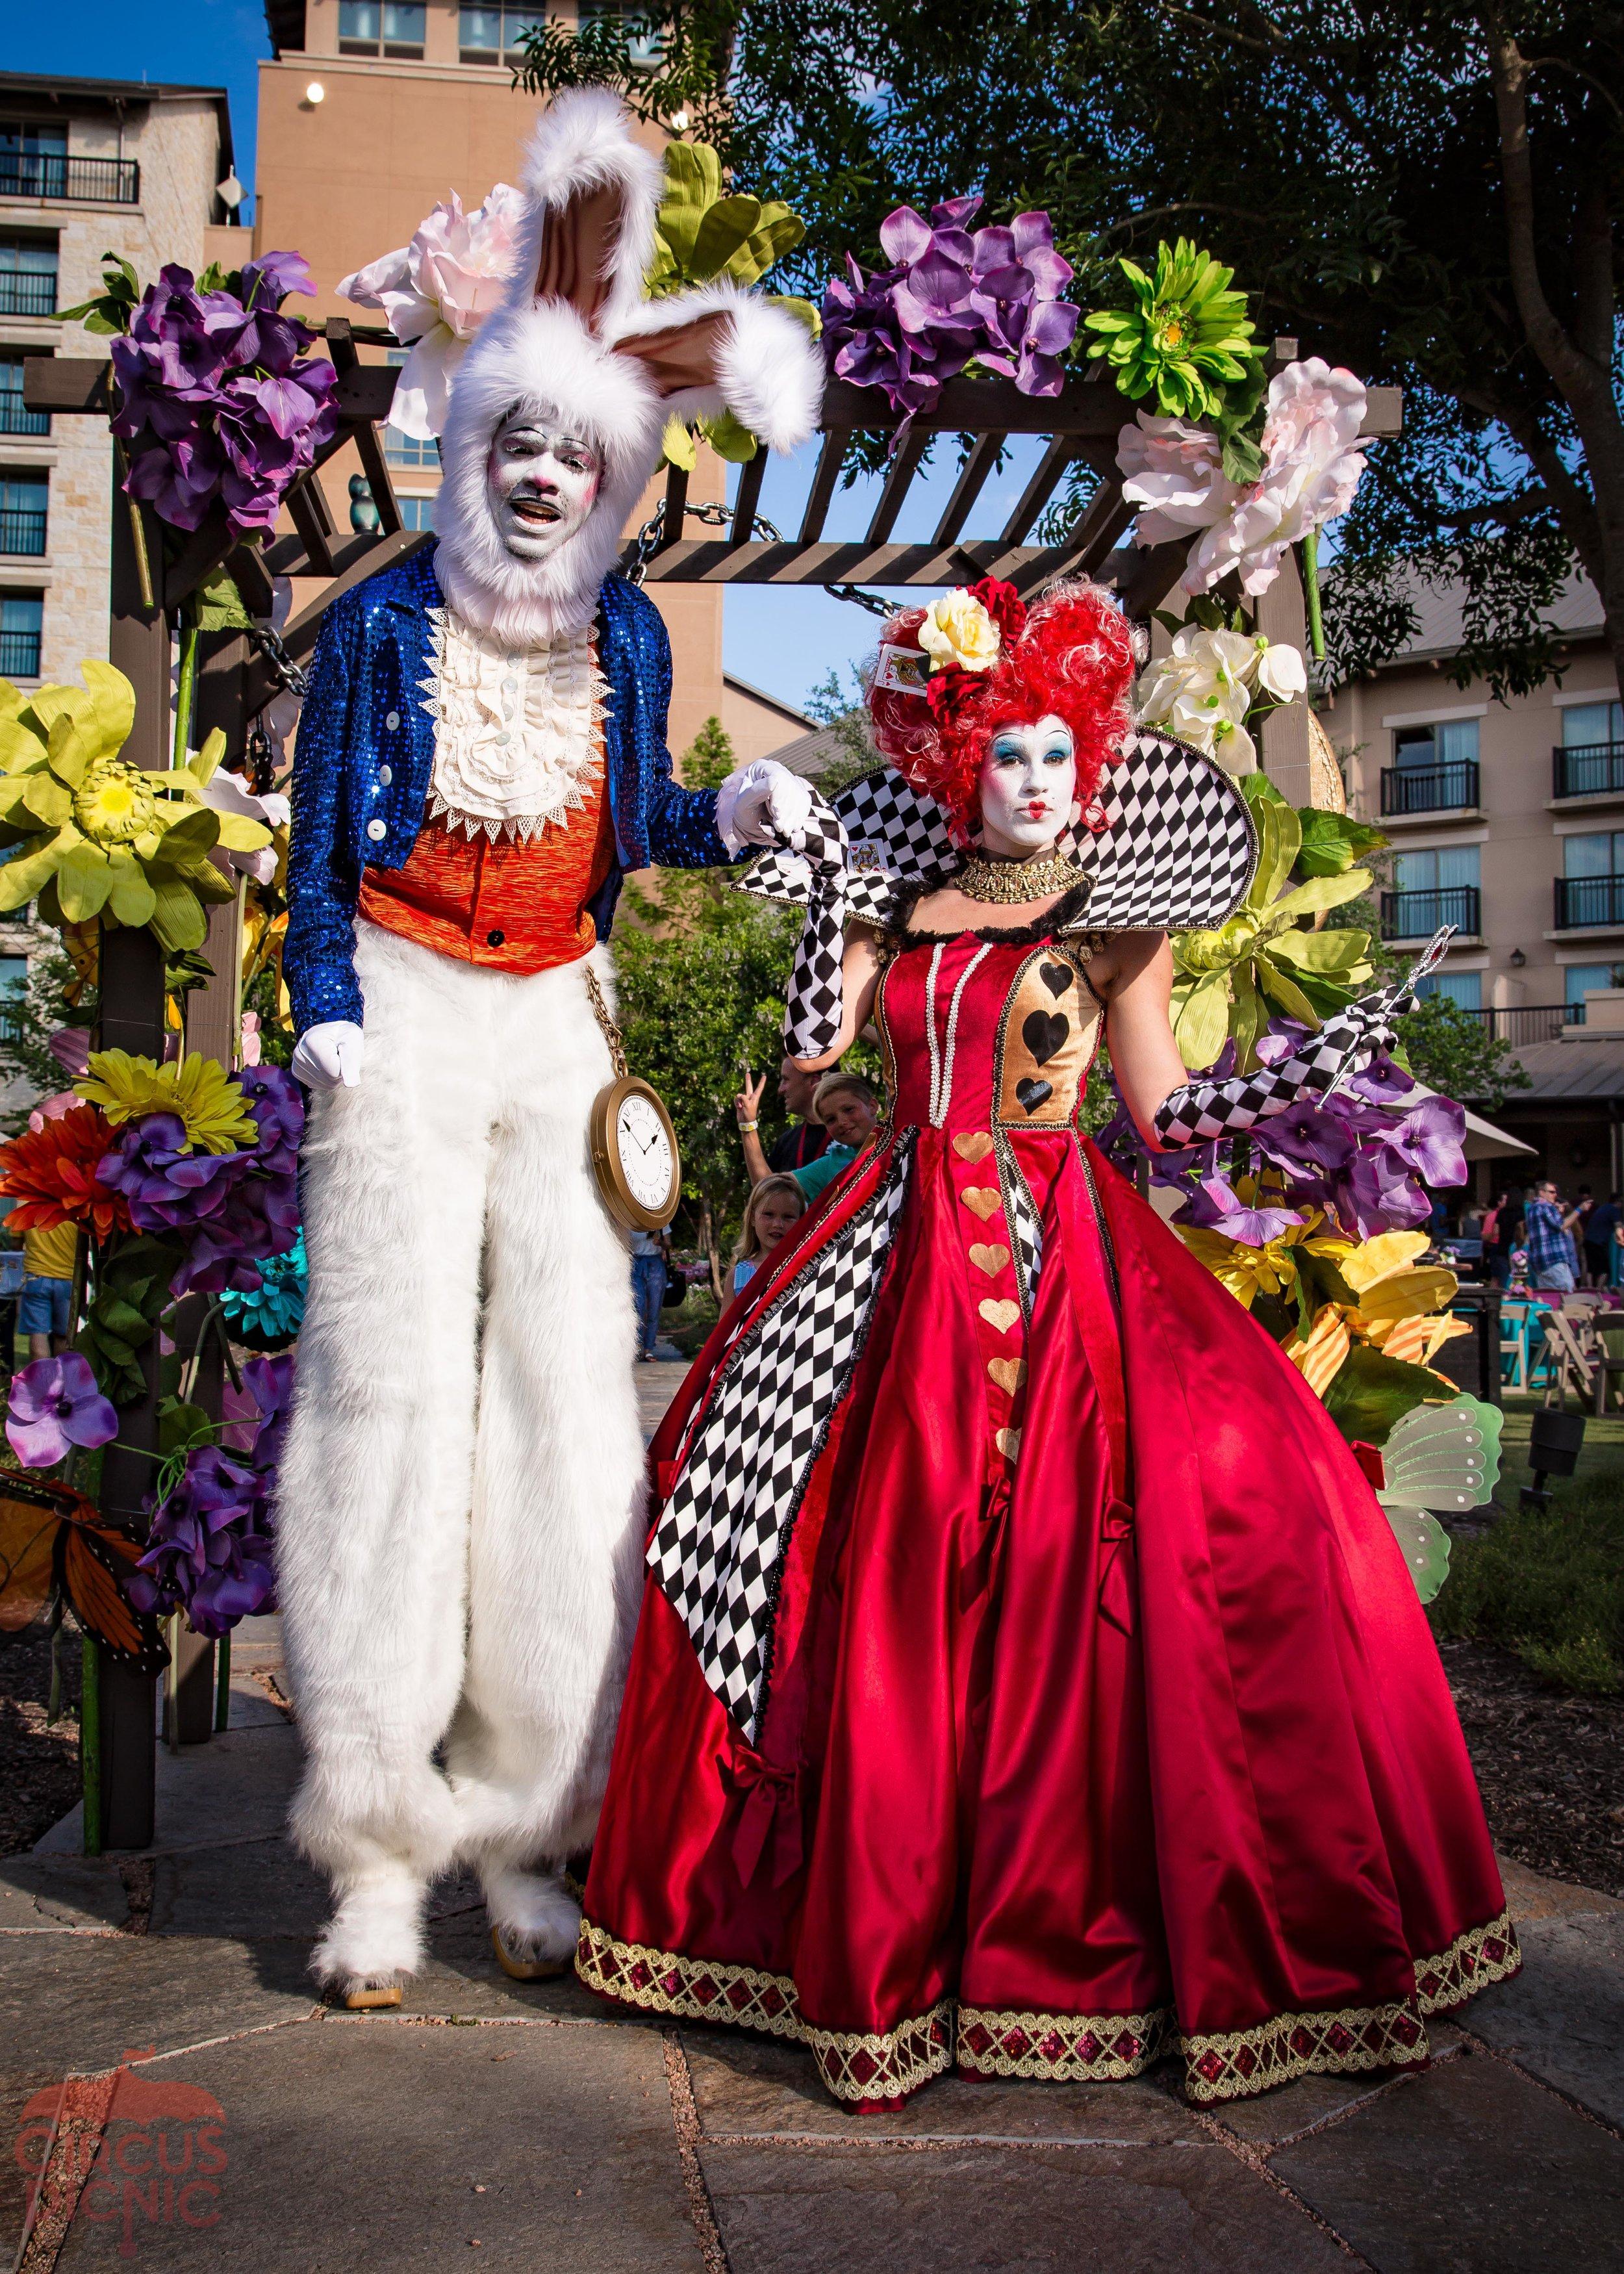 Alice_In_Wonderland_Web_Faves-10.jpg